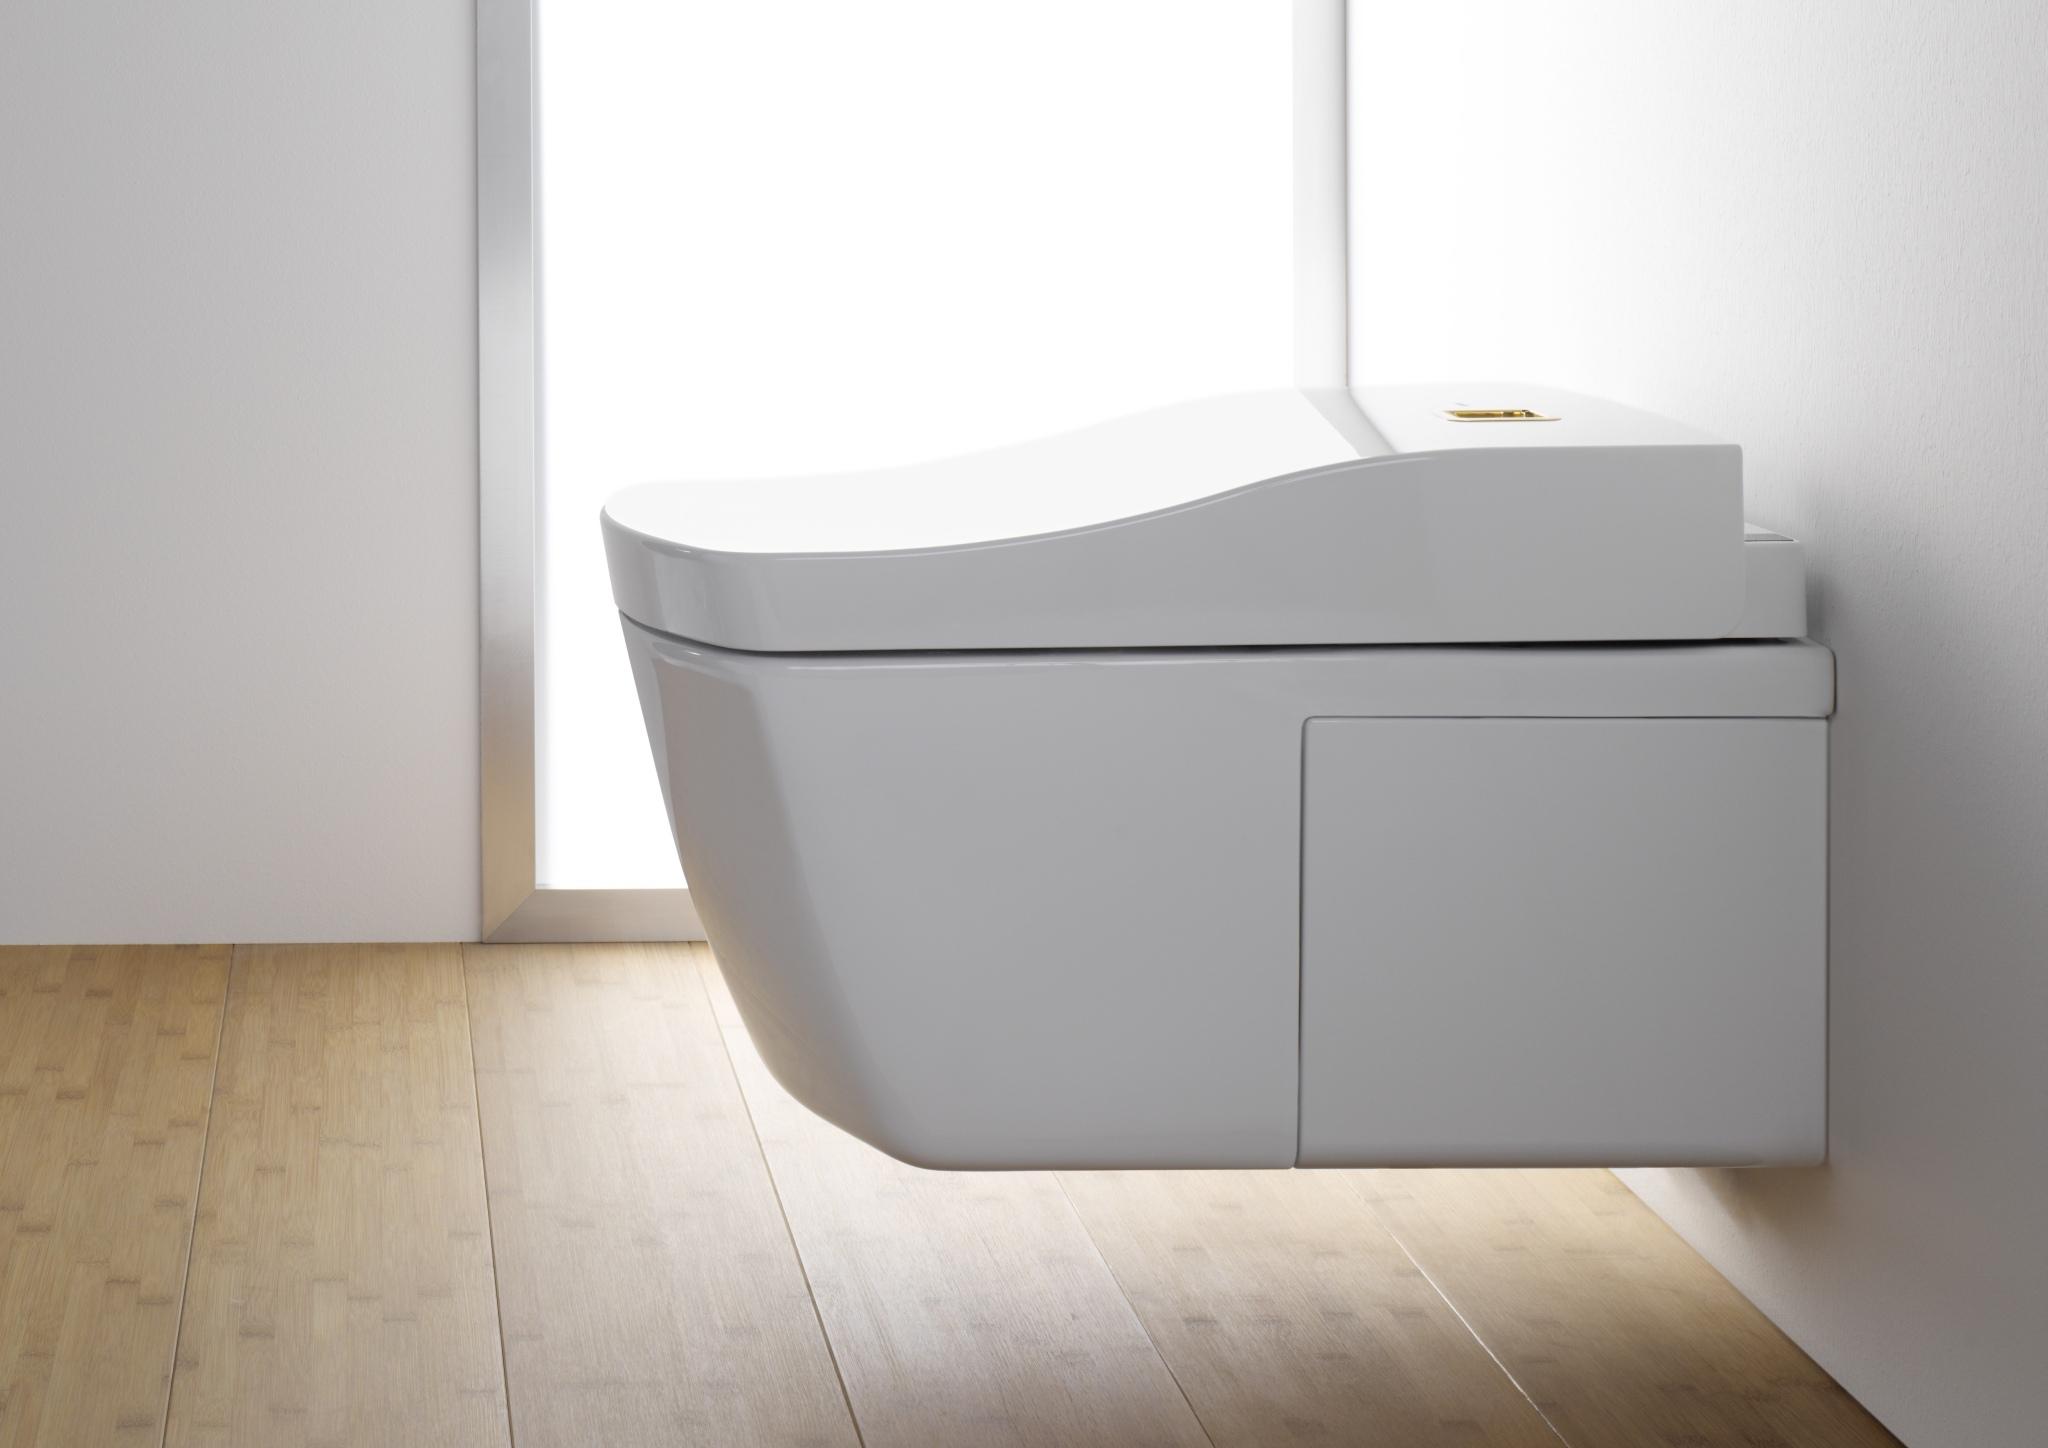 toilet flush dual piece cotton toto amazon com white plumbing dp one neorest